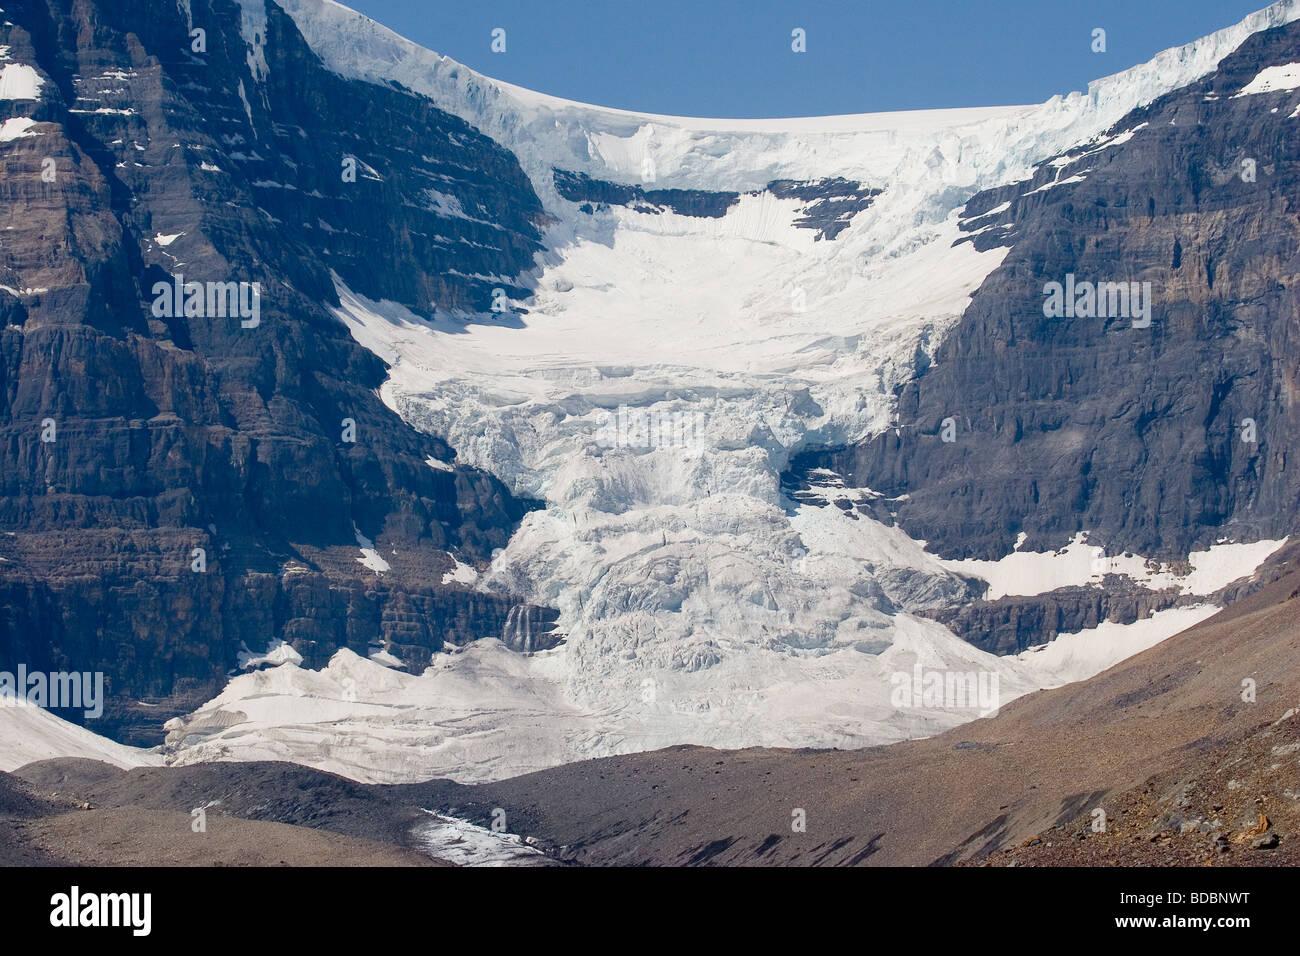 325848a02b18 The Dome Glacier in the Columbia Icefield